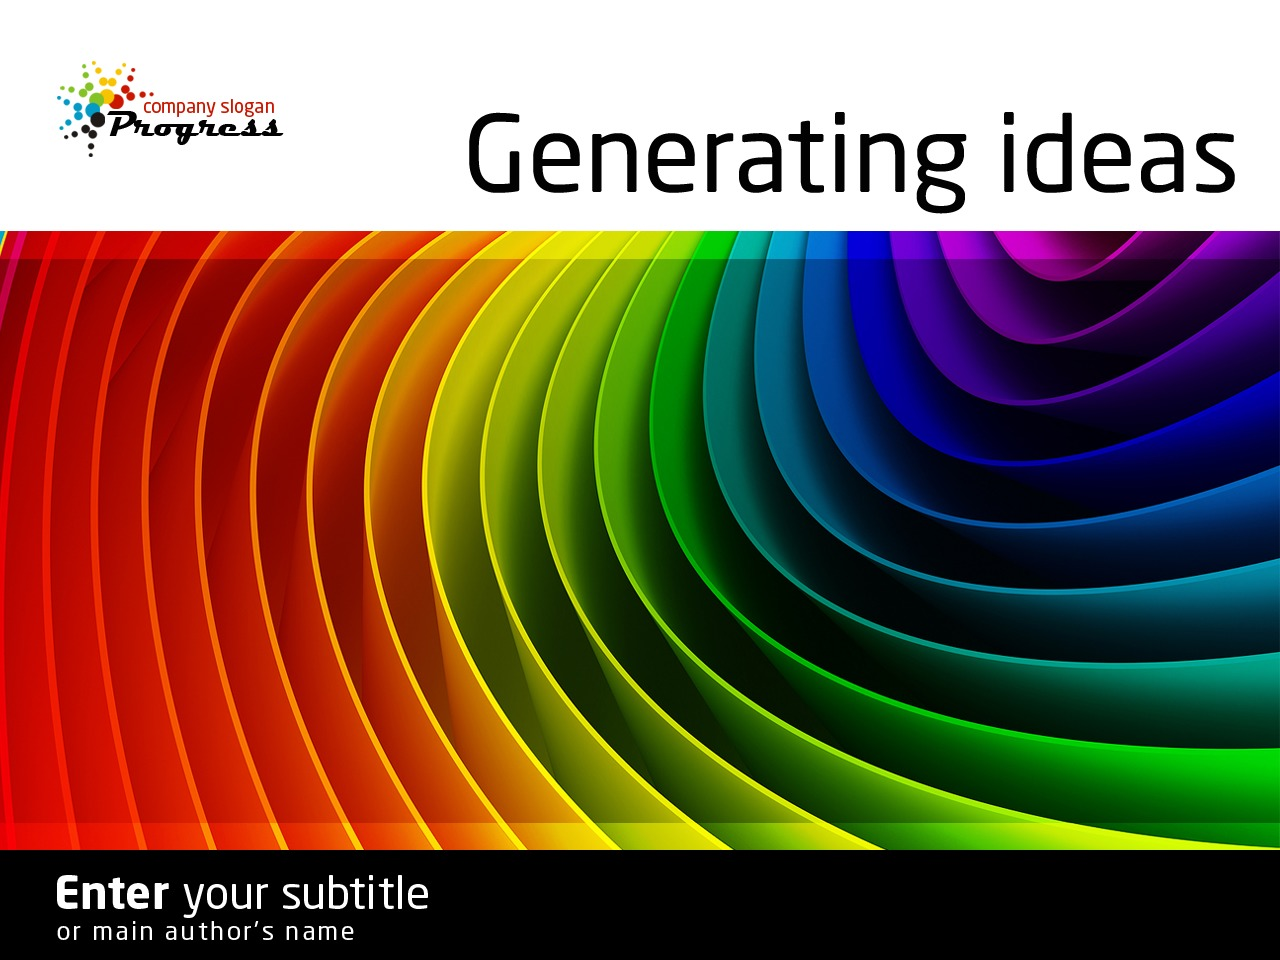 Szablon PowerPoint #34170 na temat: studio projektowe